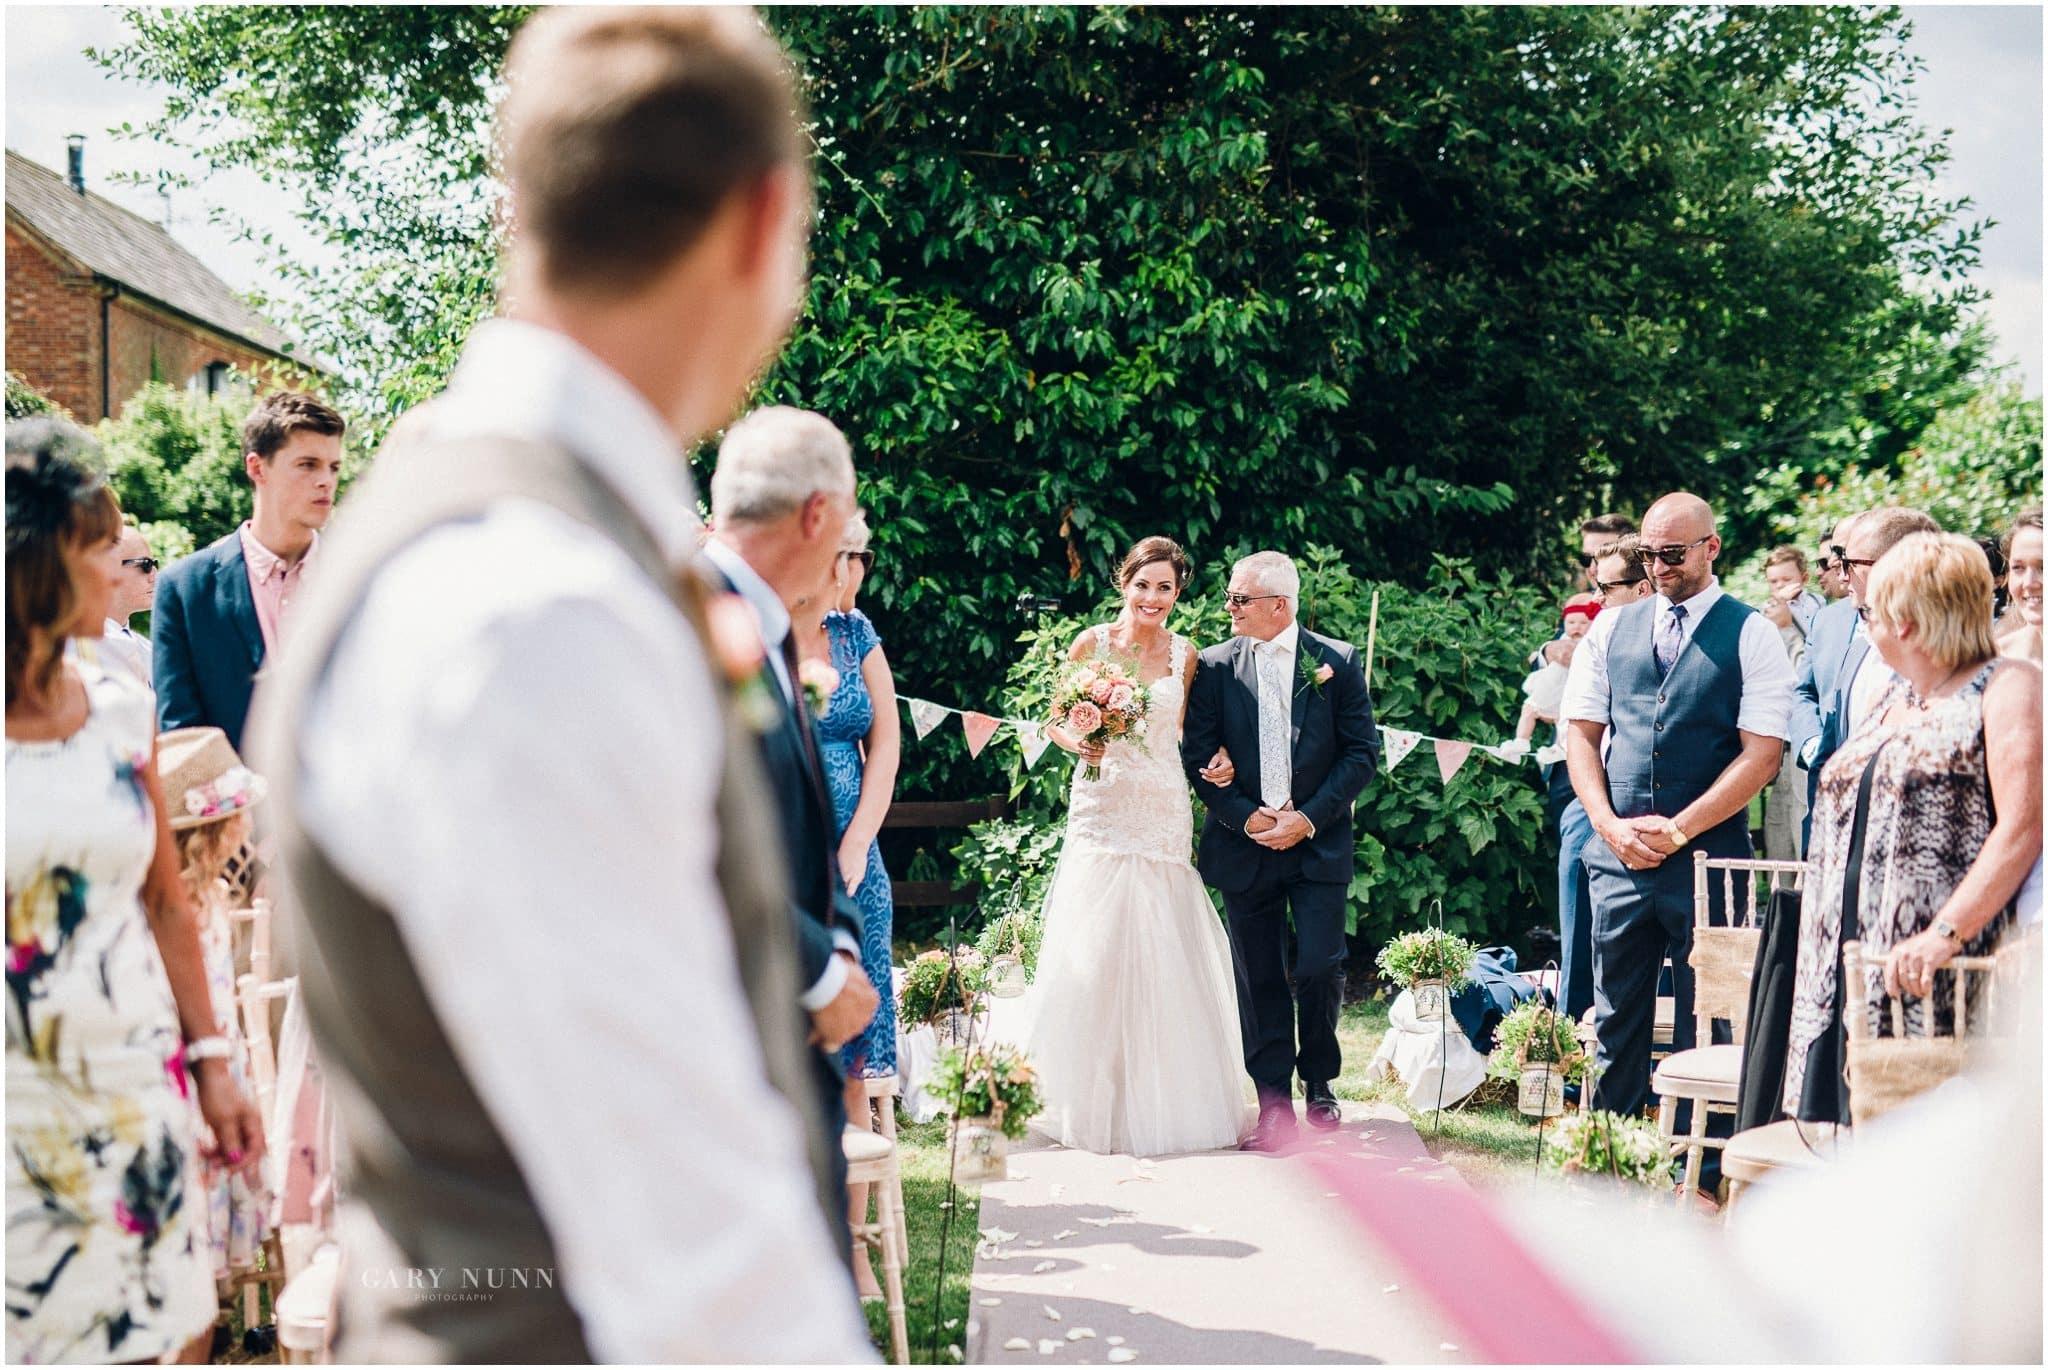 unplugged wedding, bride walking down the isle